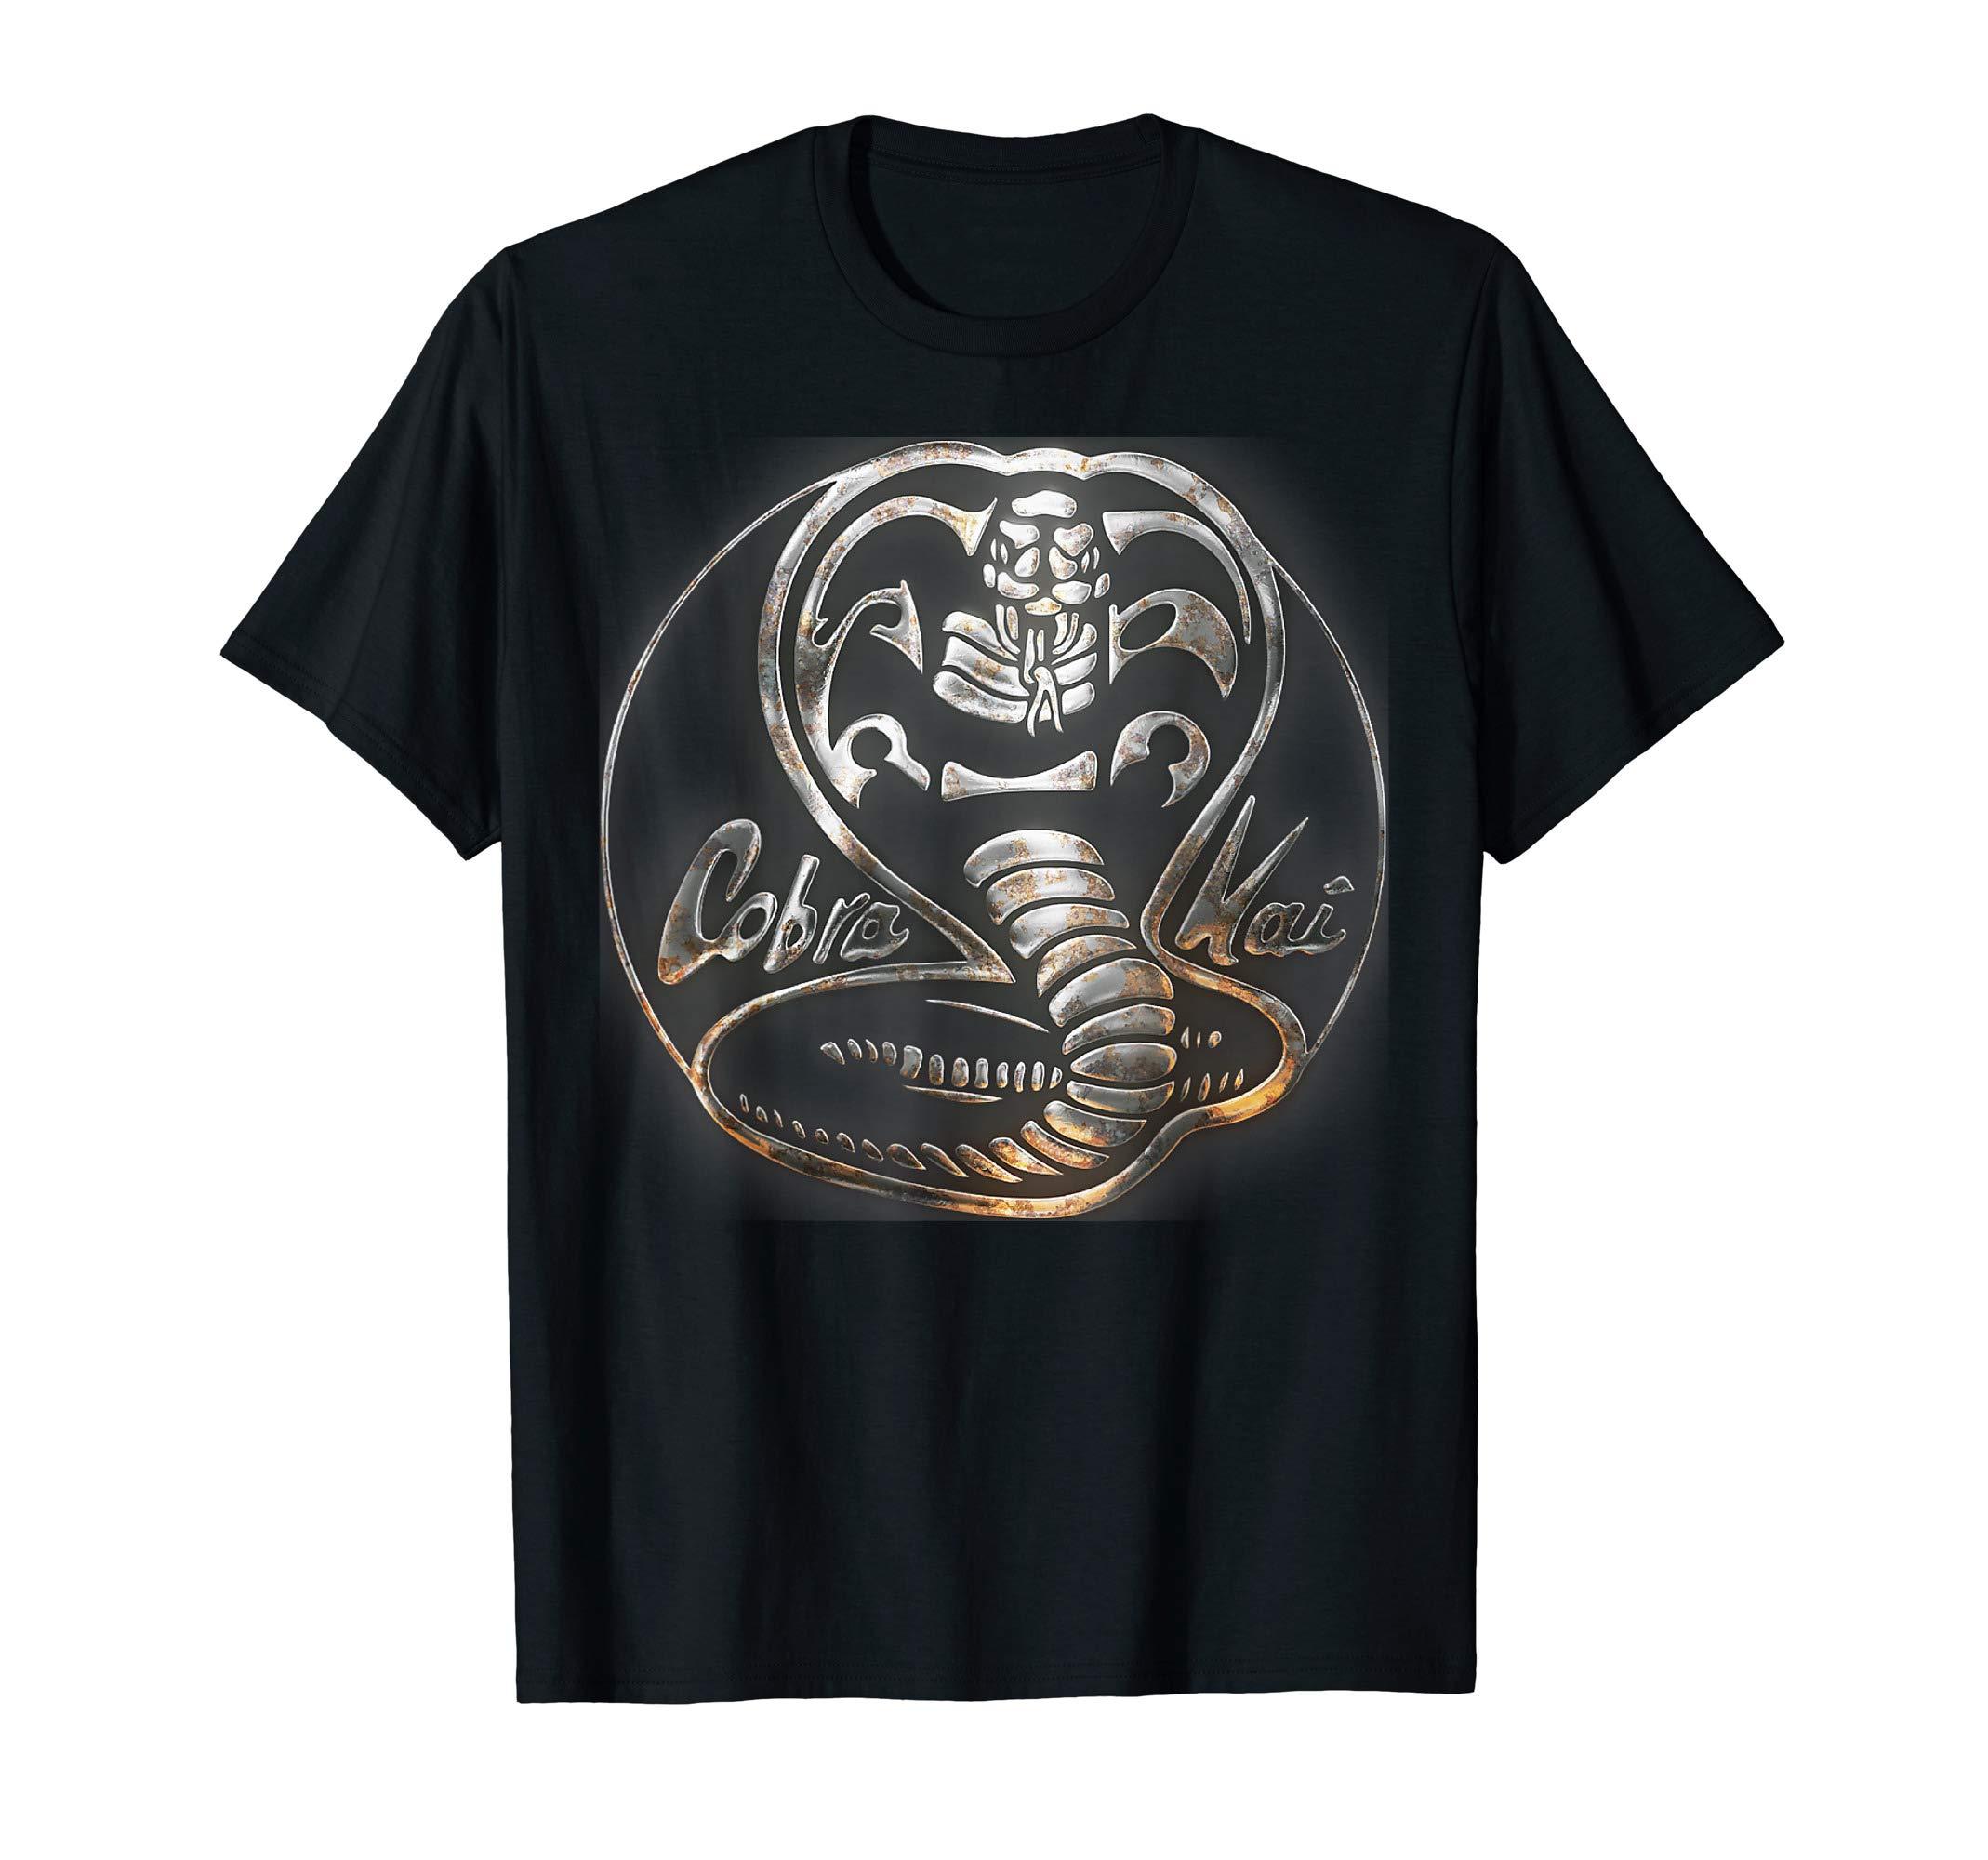 Solid Snake - Metal Gear Solid T-shirt by MojoJoJo326